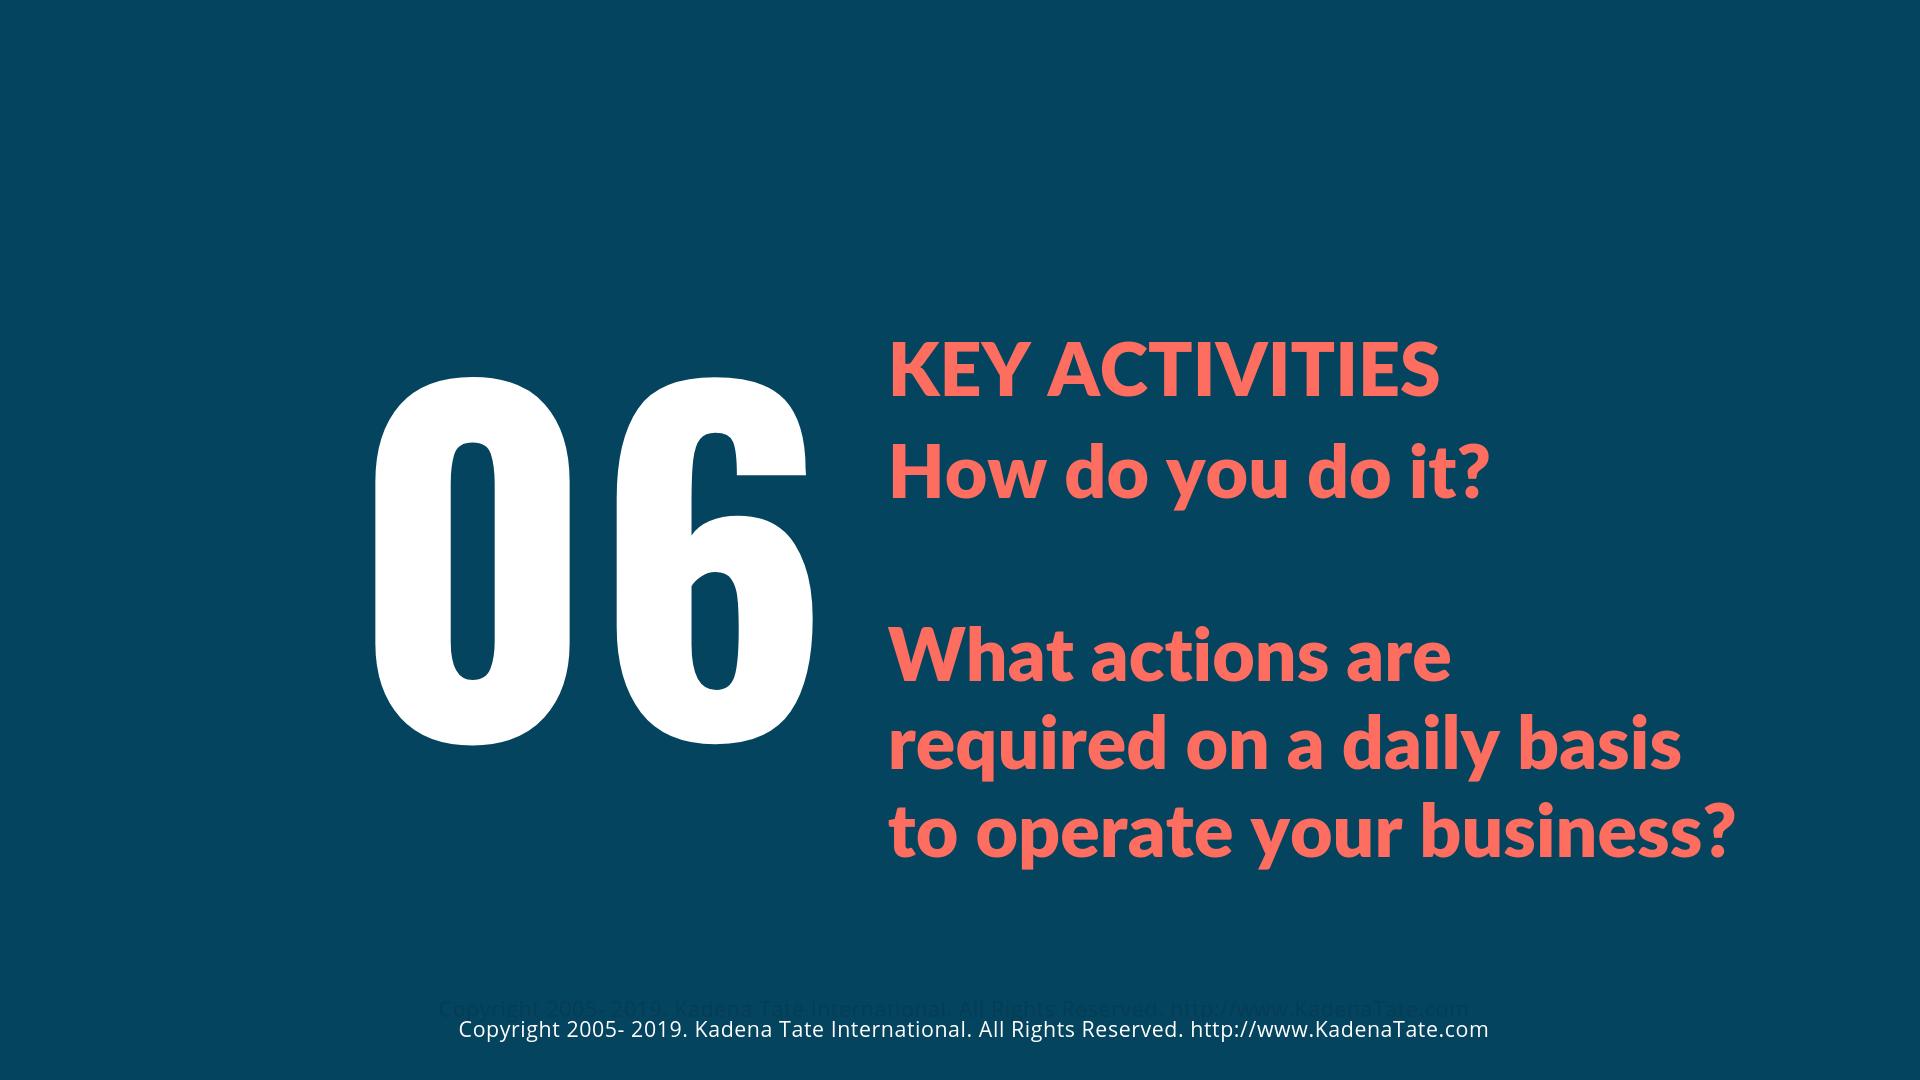 16keyactivities.png